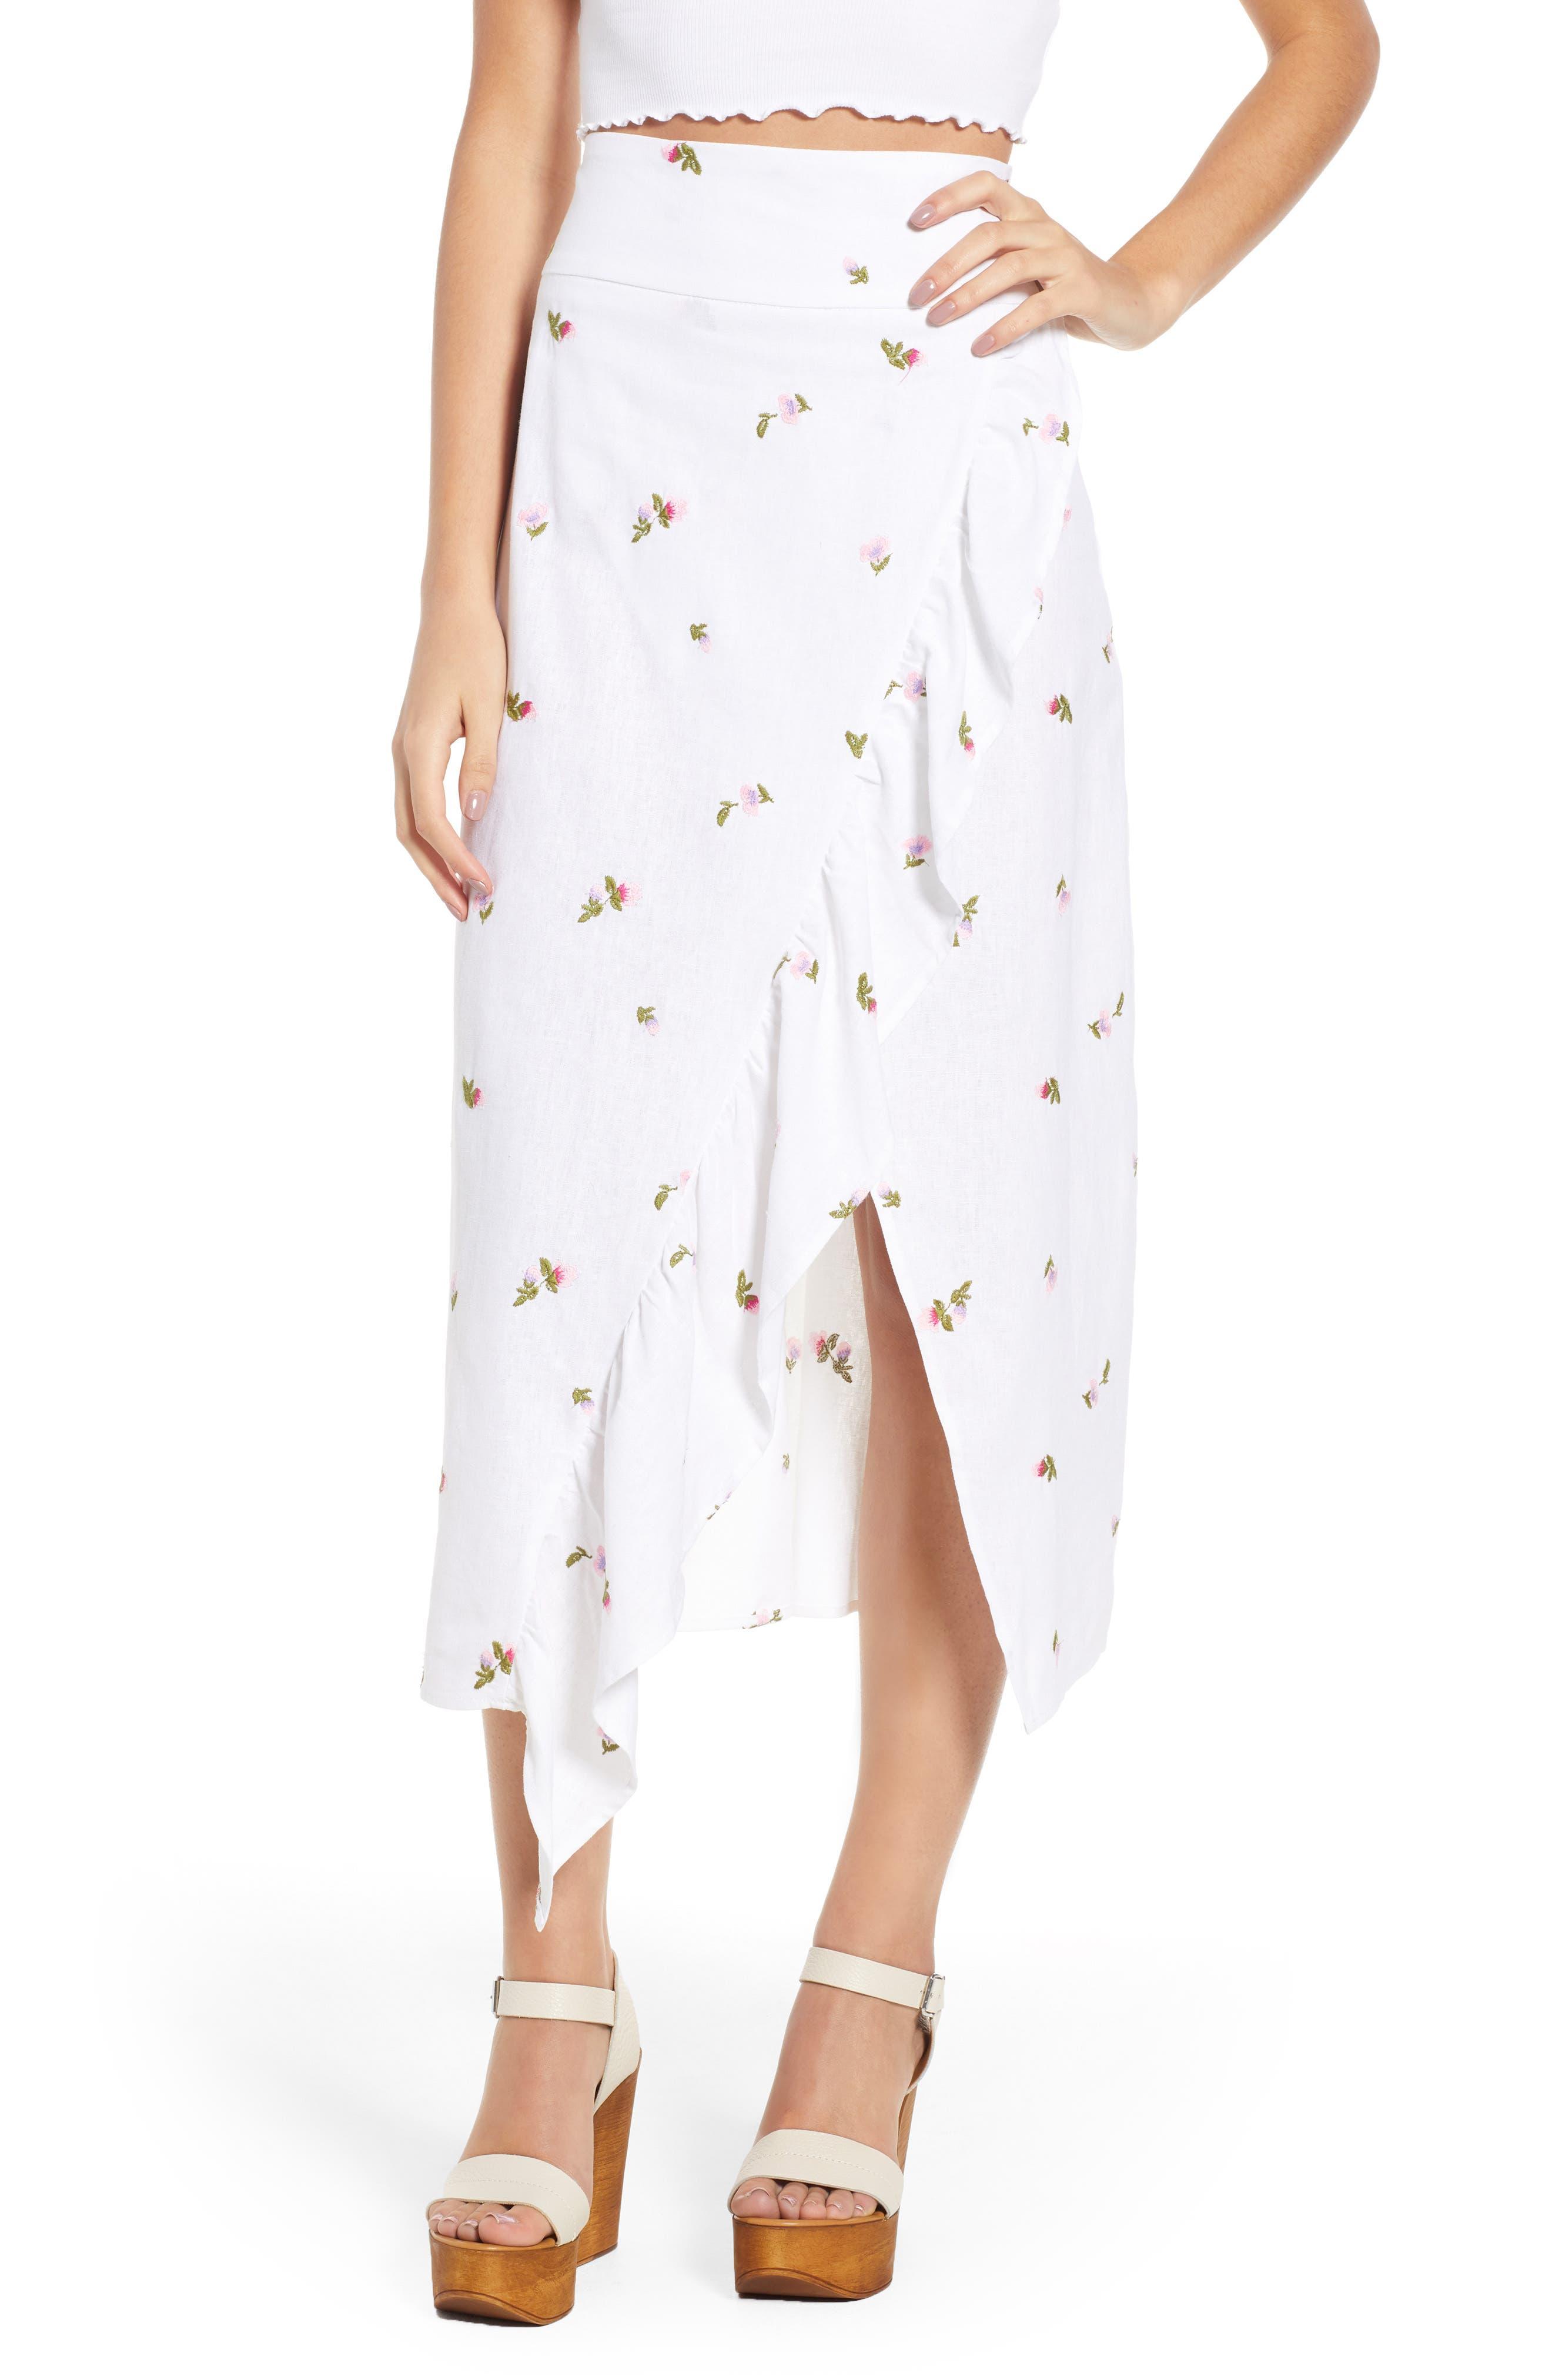 Sunset Midi Skirt,                             Main thumbnail 1, color,                             Ditsy Embroidery